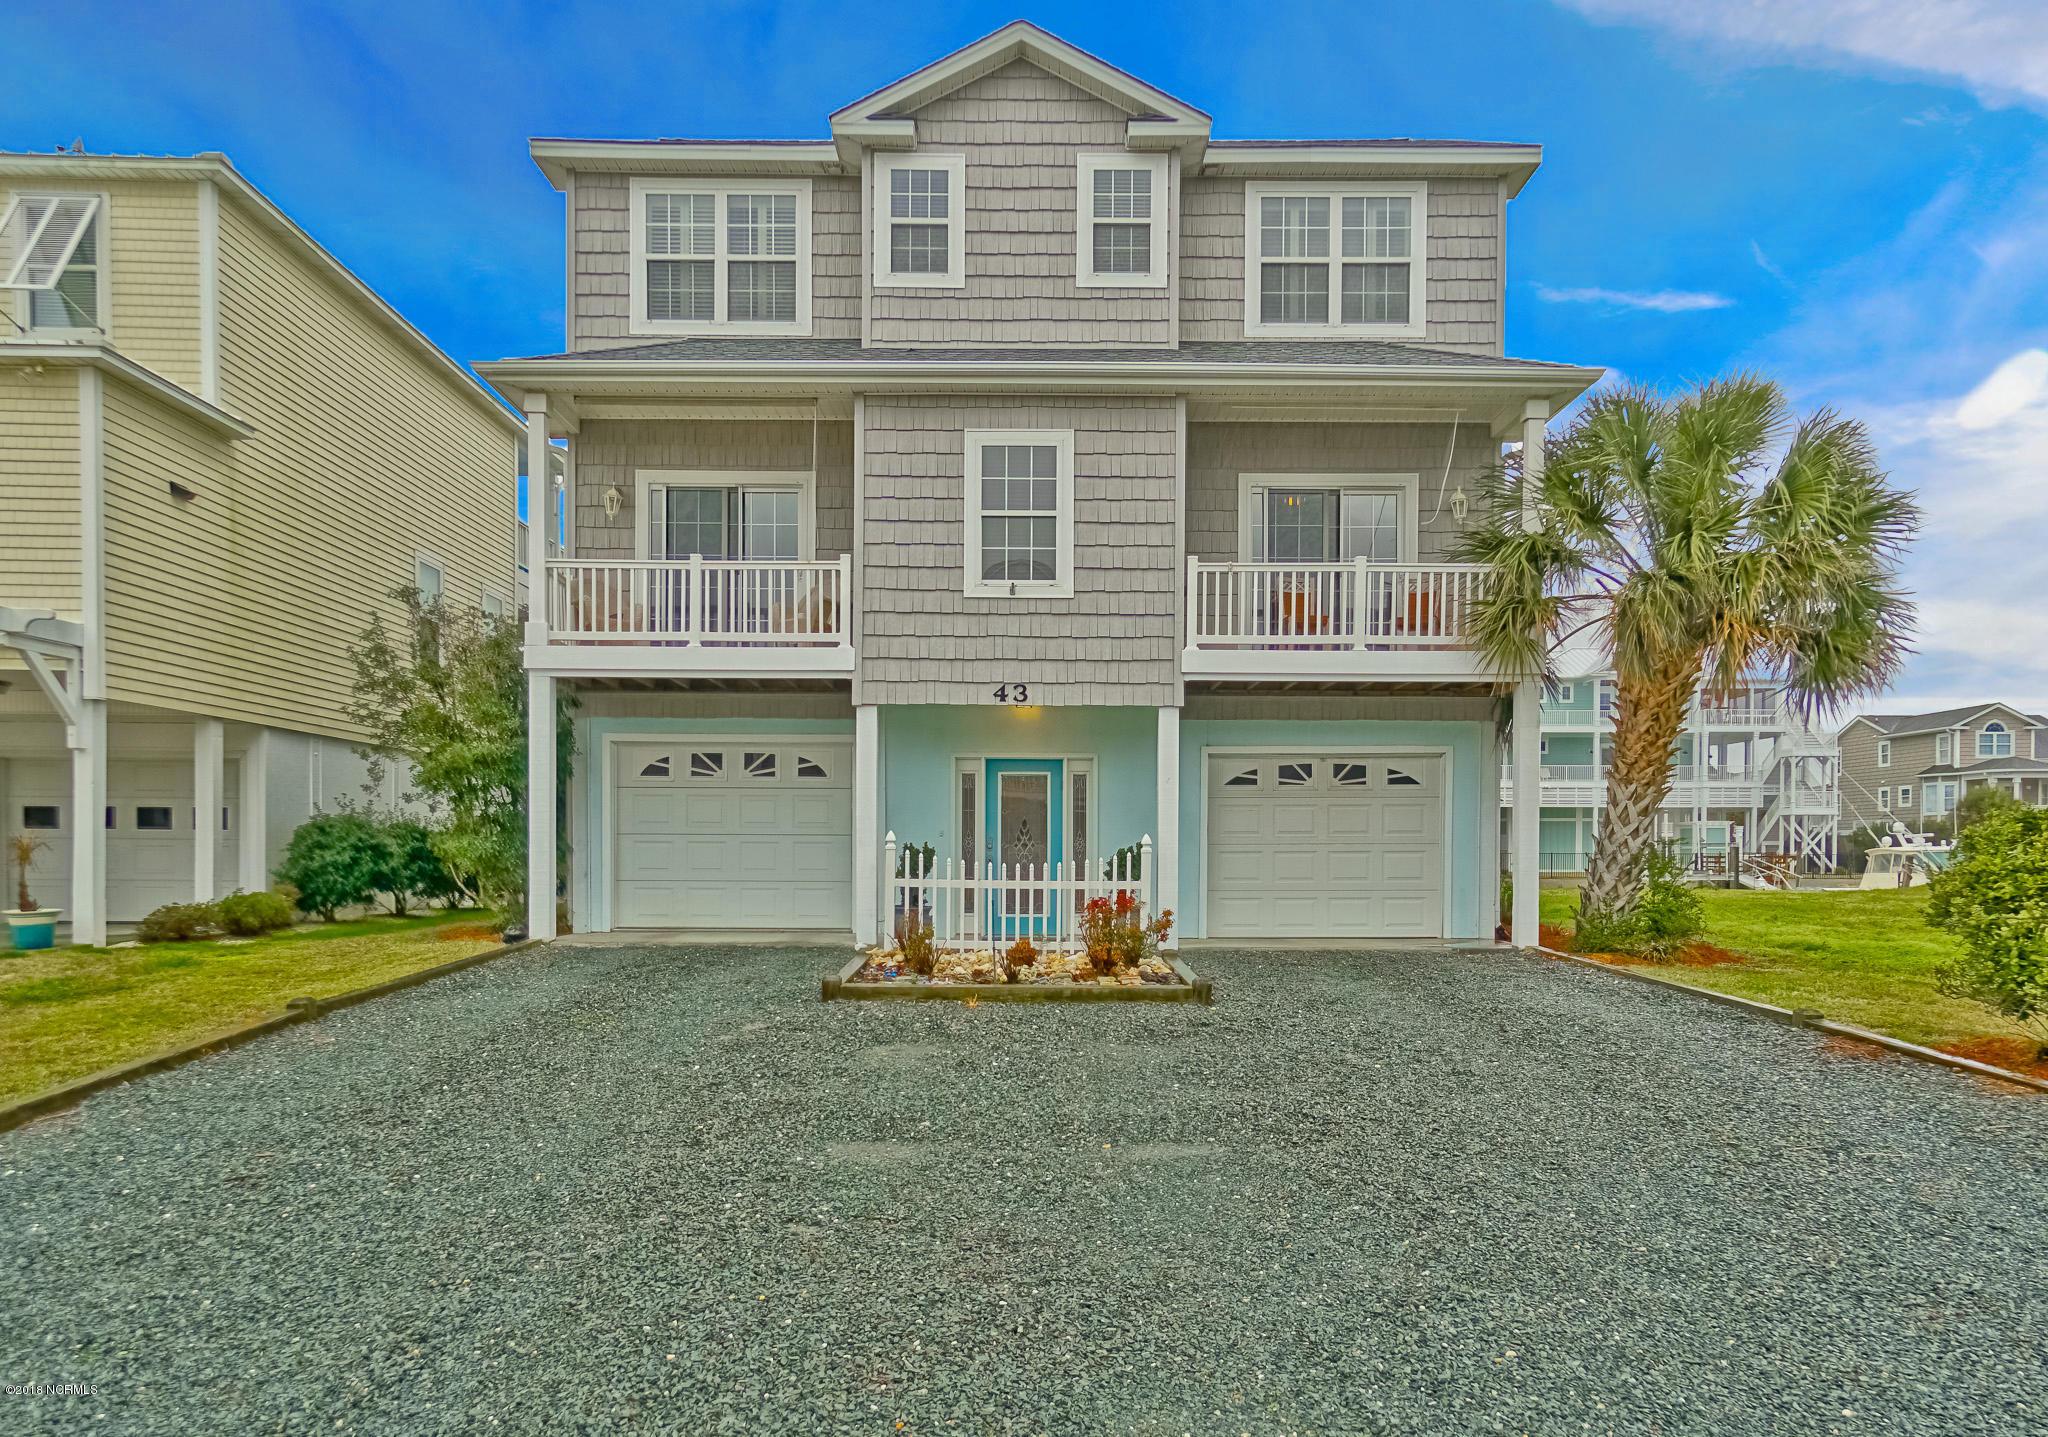 43 Goldsboro Street Ocean Isle Beach, NC 28469